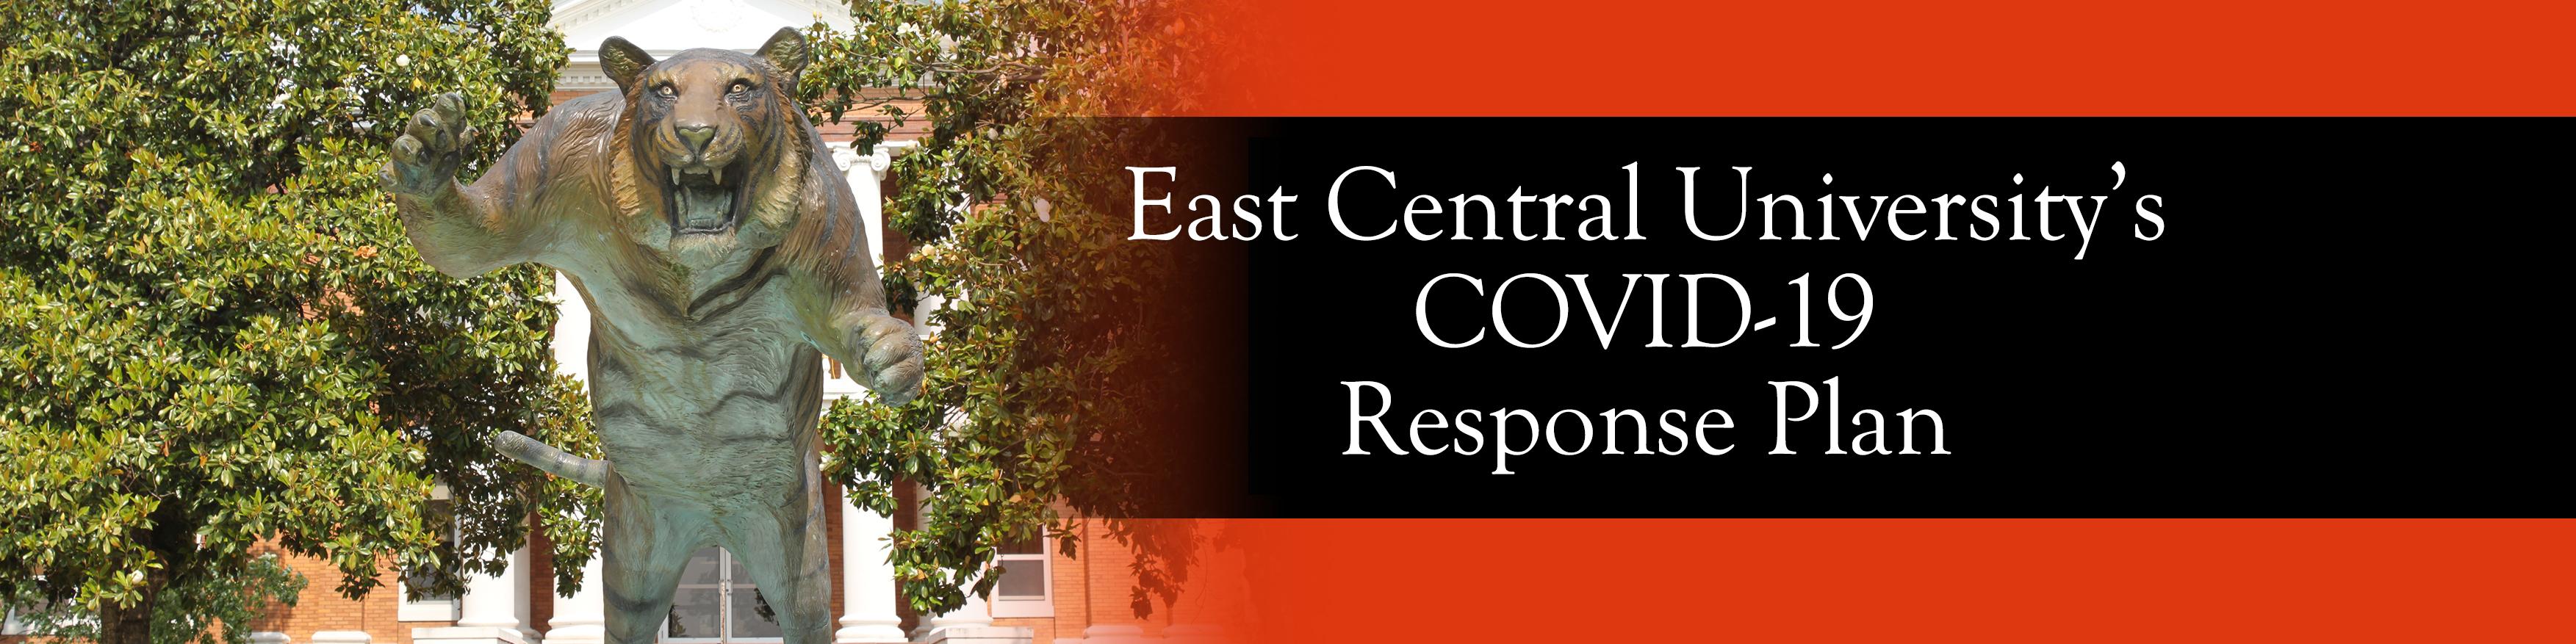 ECU COVID-19 Response Plan